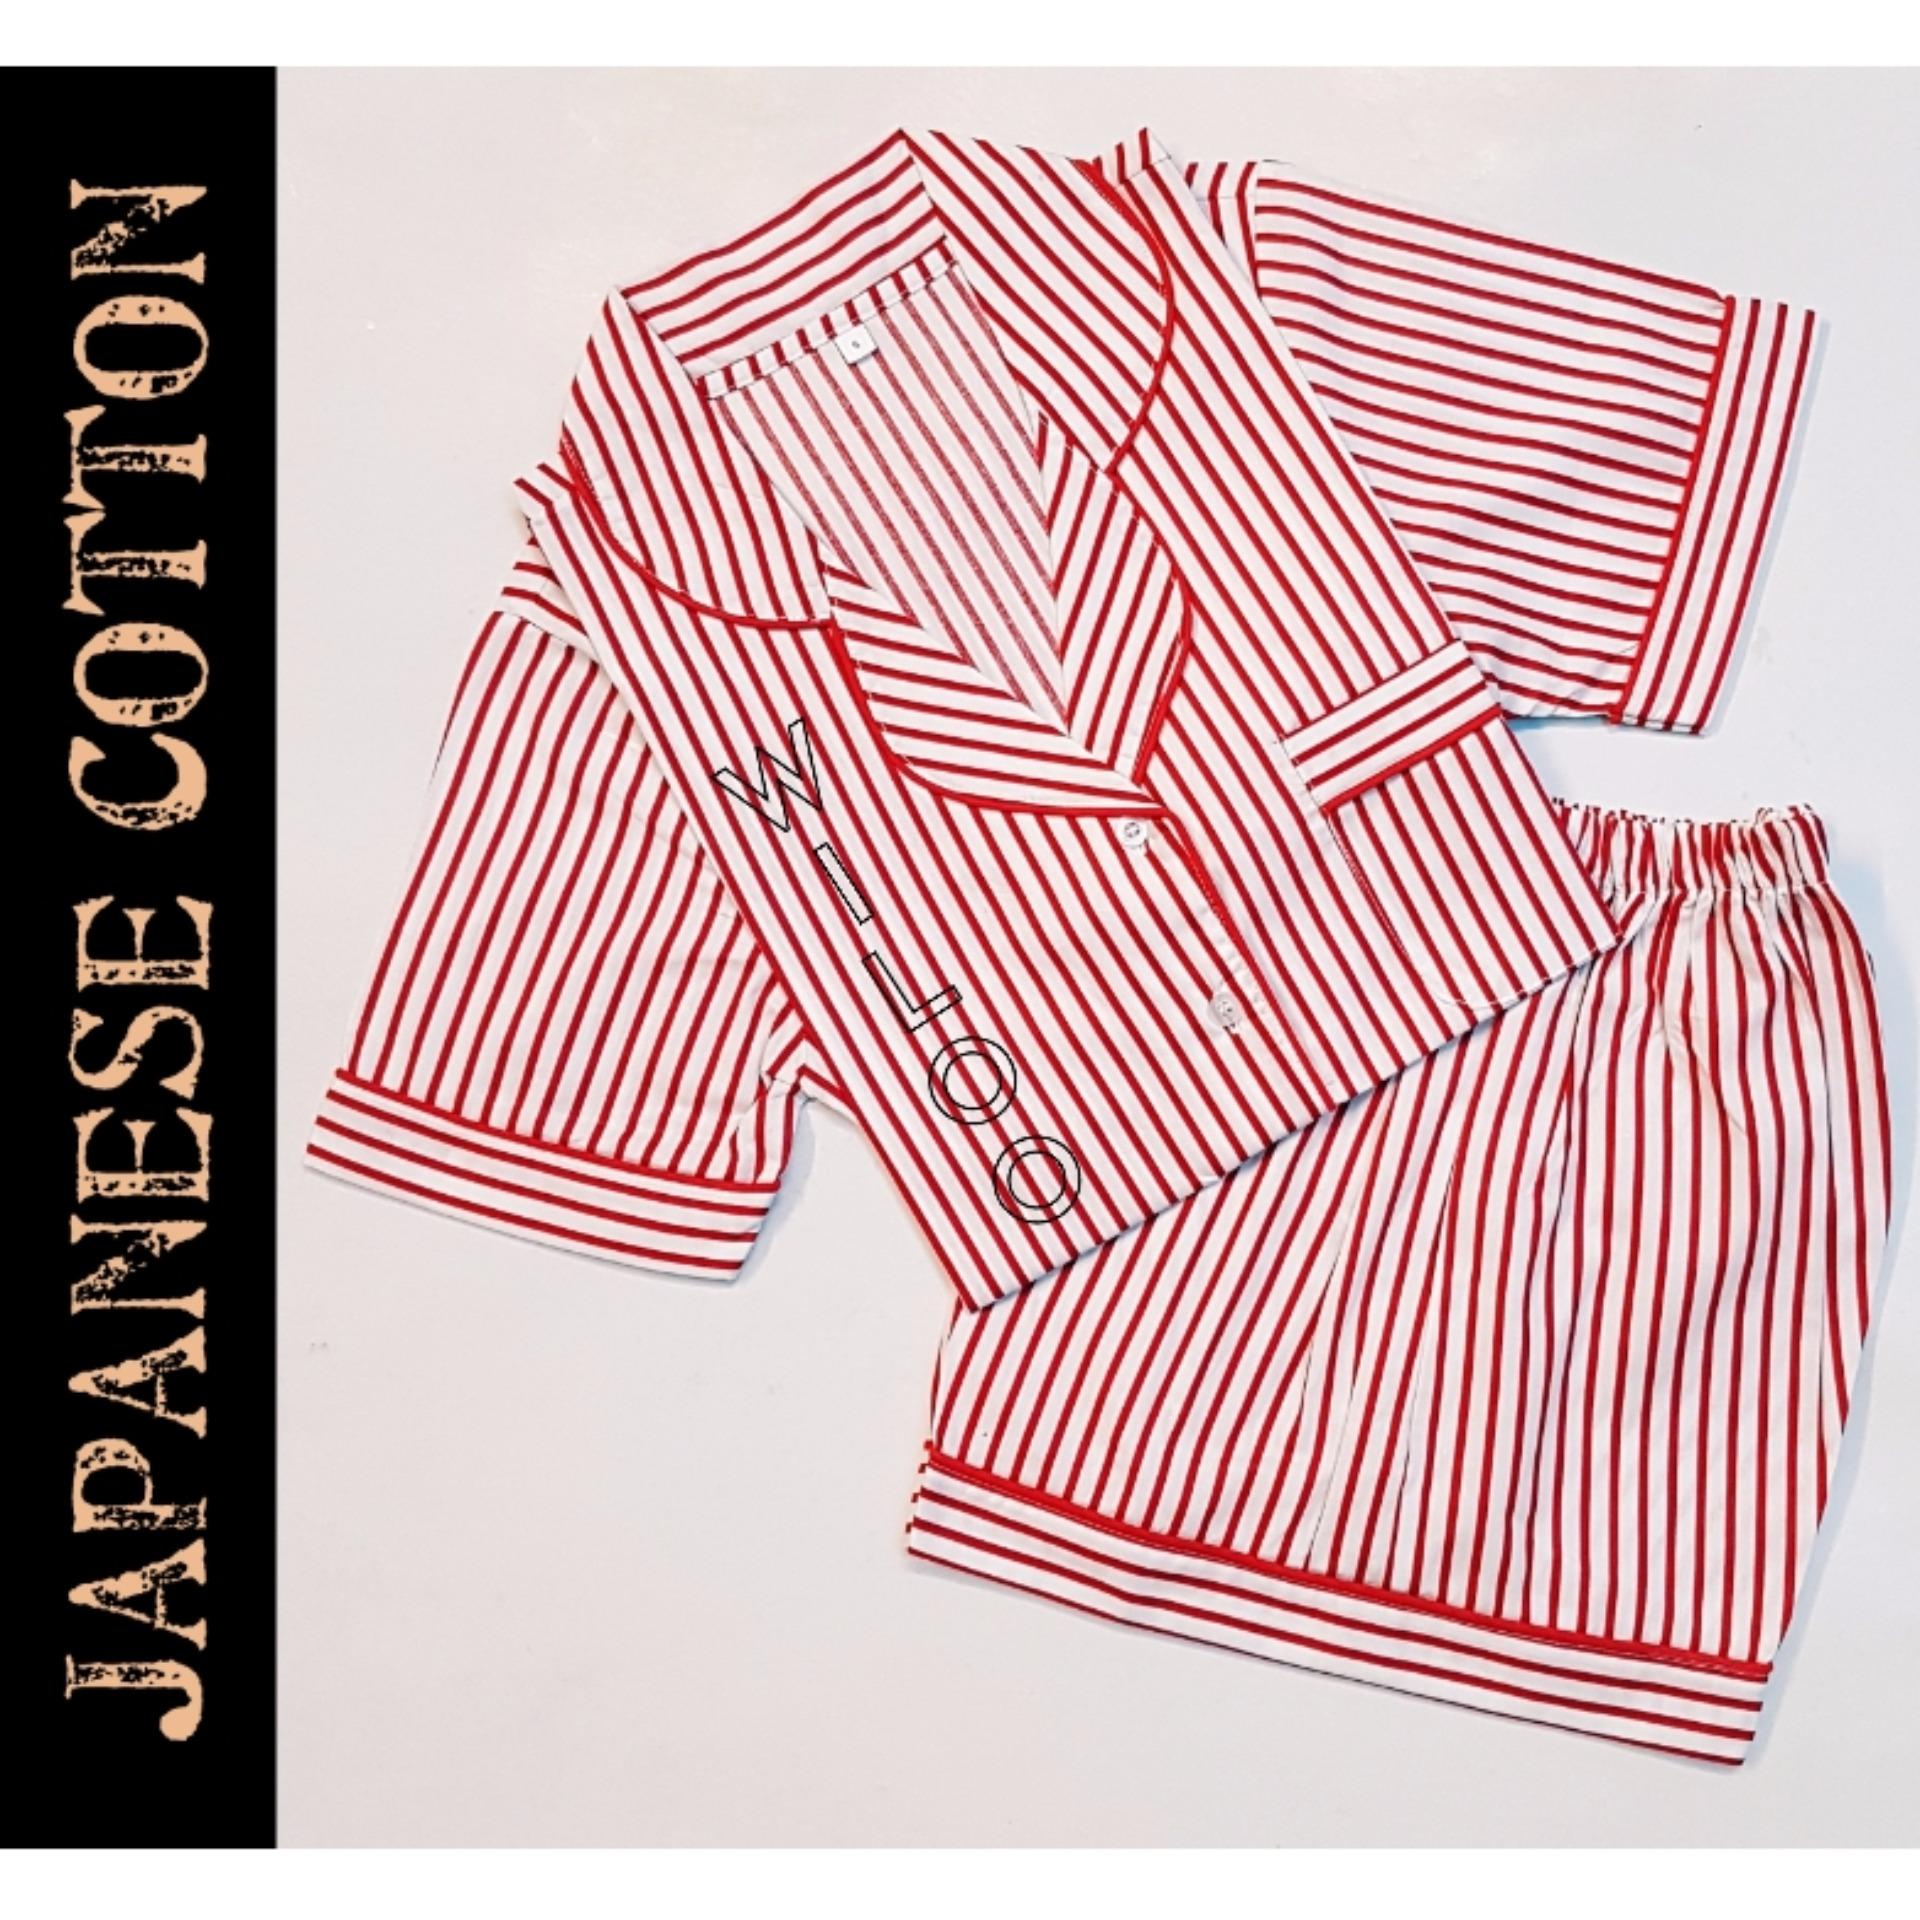 Harga Baju Tidur Wanita Piyama Japanese Cotton Salur Cs Termahal